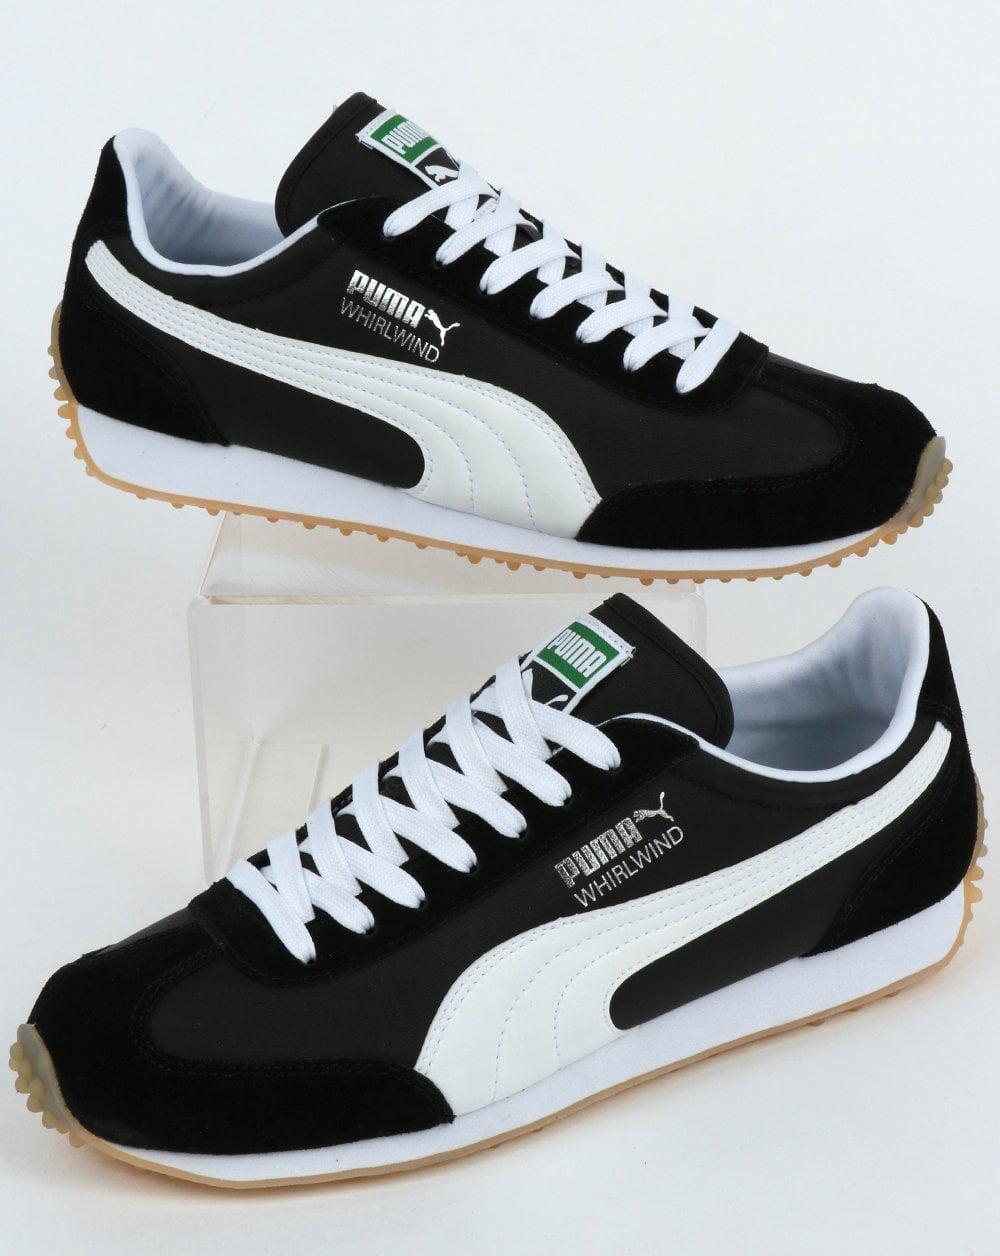 Puma Whirlwind Classic Trainer Black/White/Silver,running